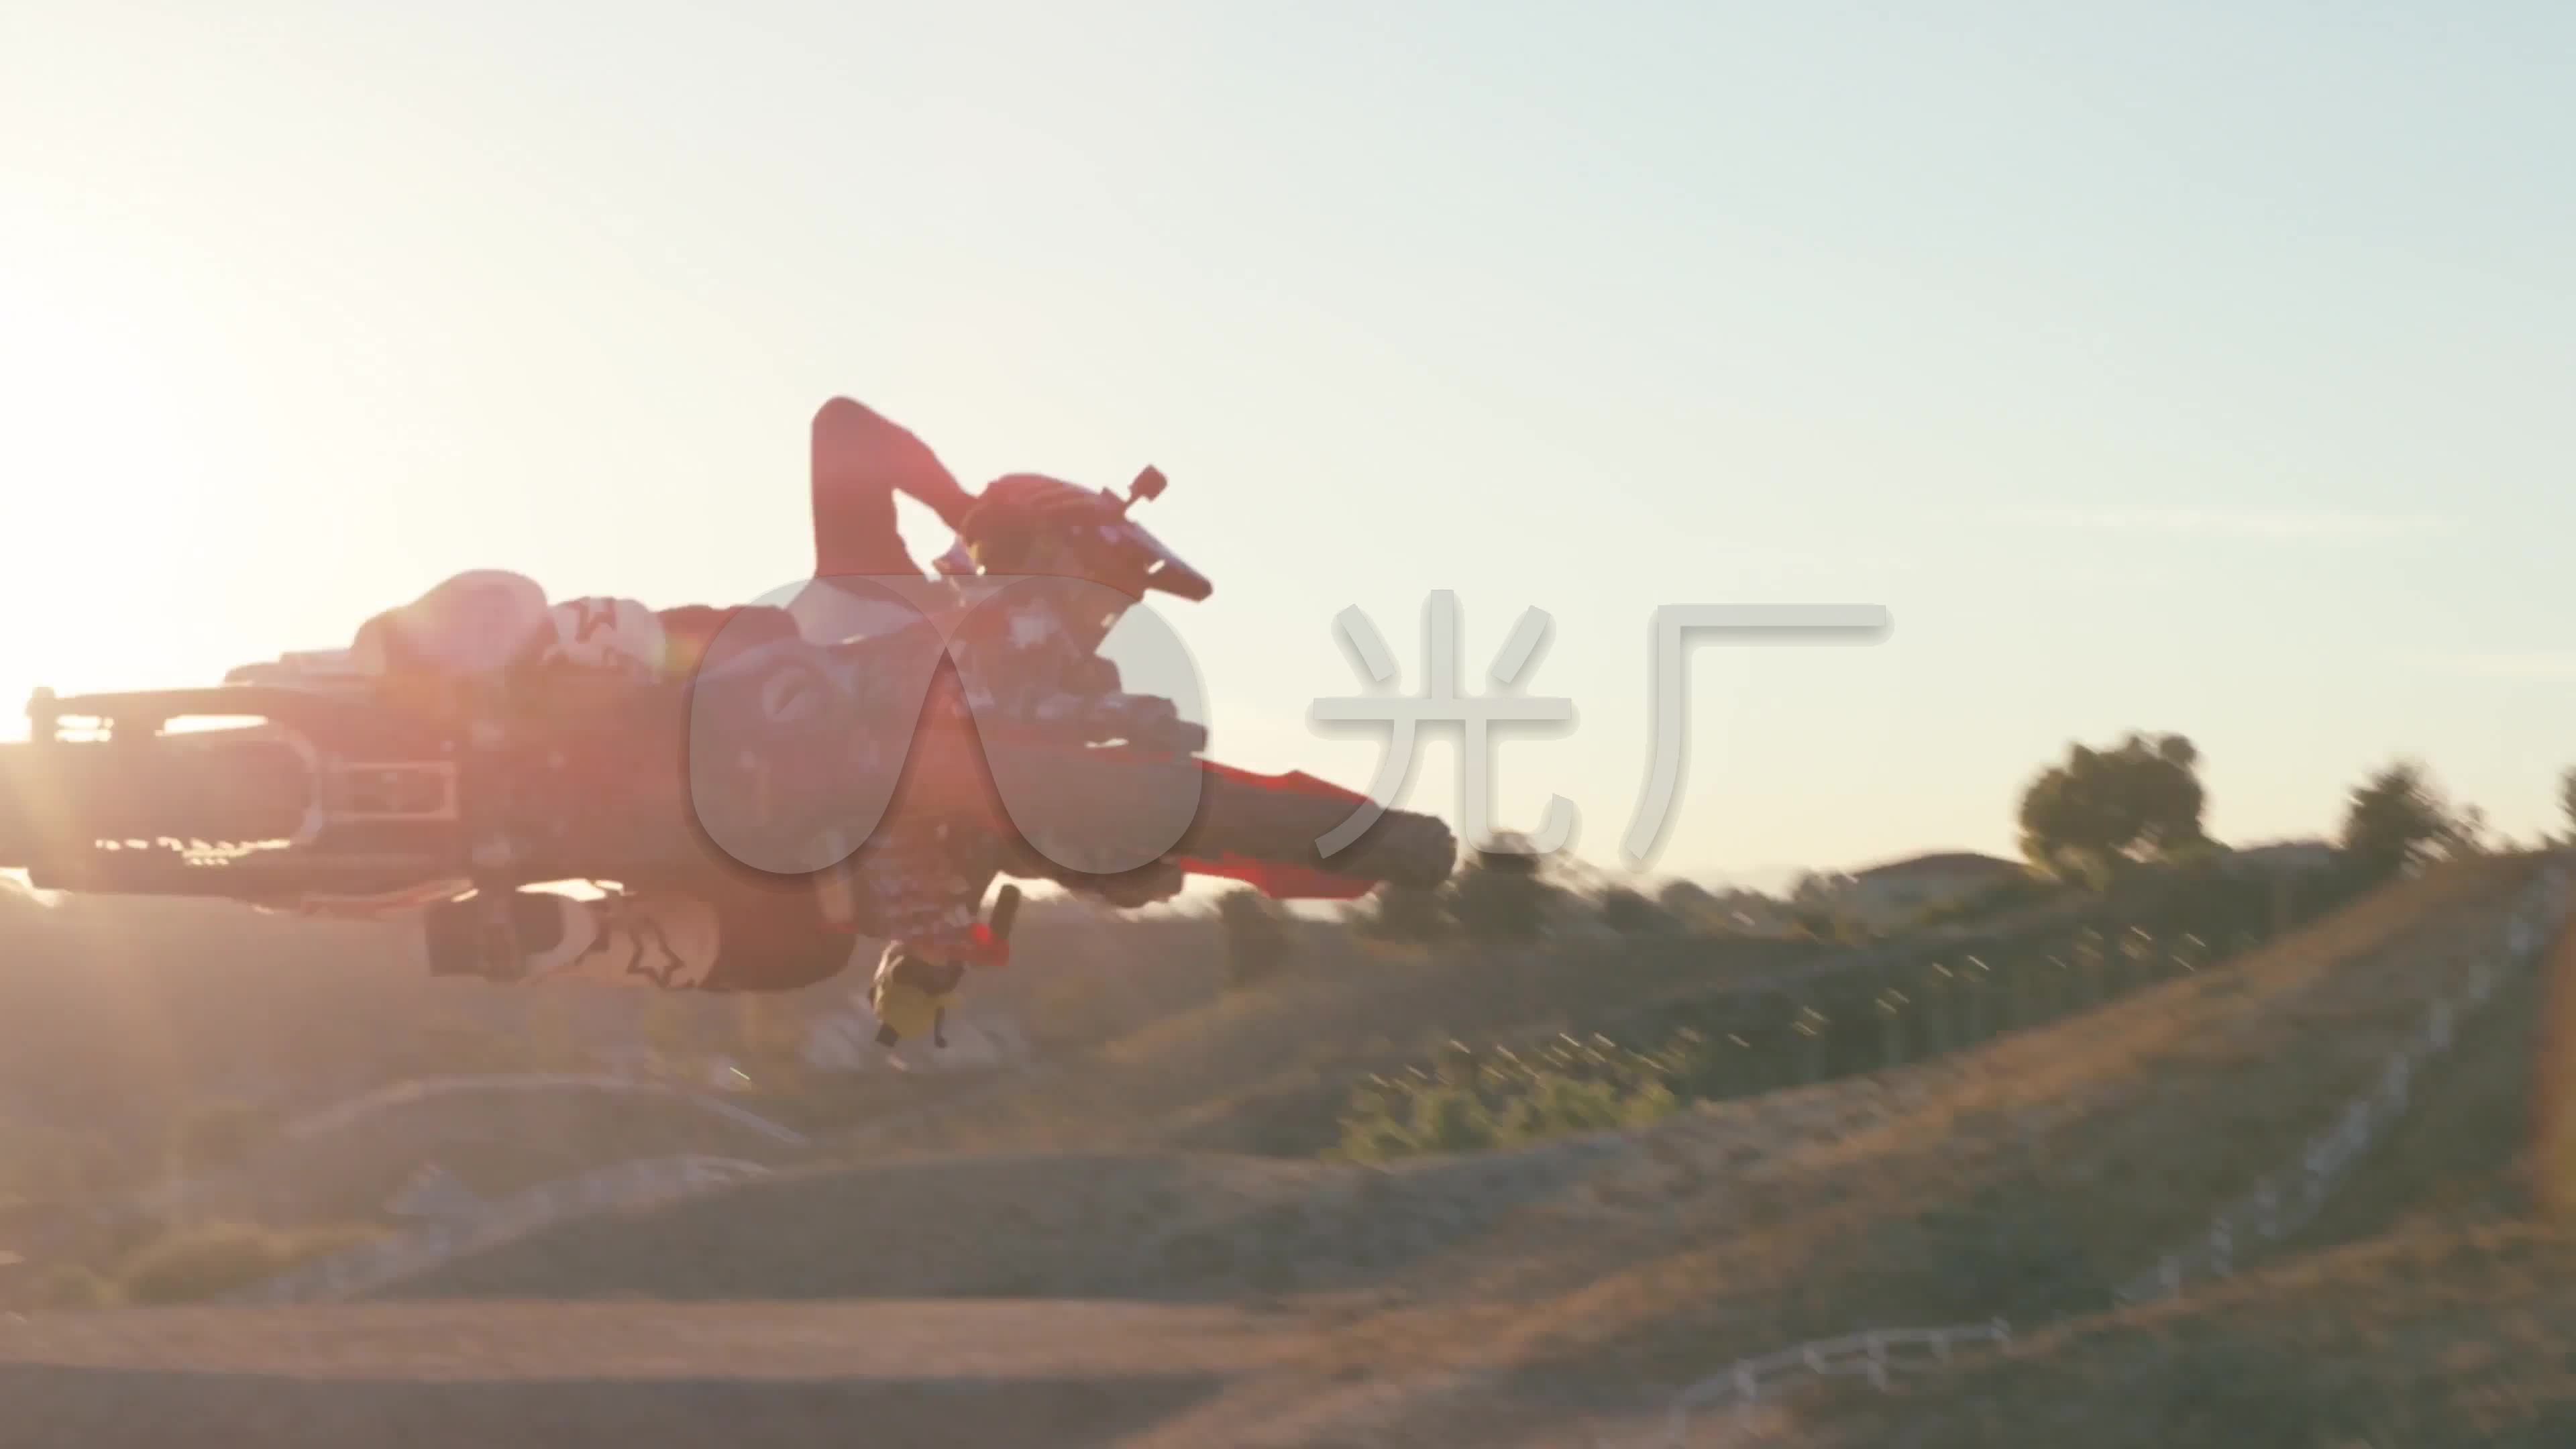 v滑板滑板摩托山地自学4K_3840X2160_视频视高清冲浪c图片